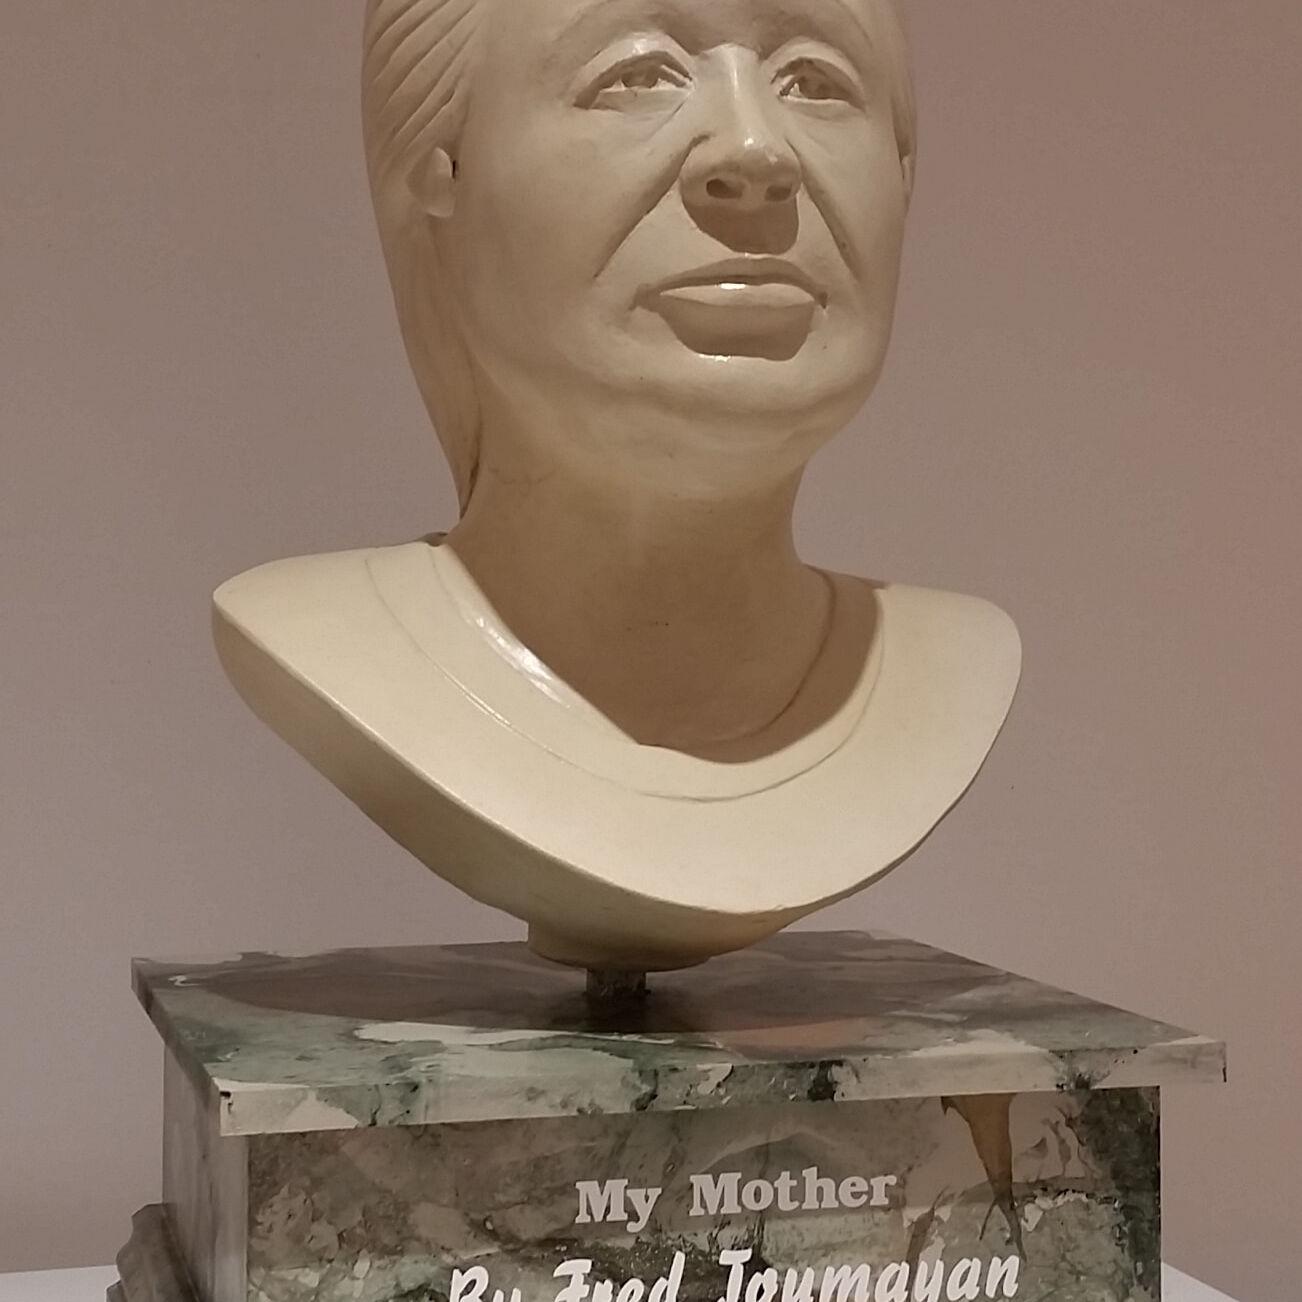 Fred Toumayan VAS—My Mother, Clay, NFS_Winner 2021_2